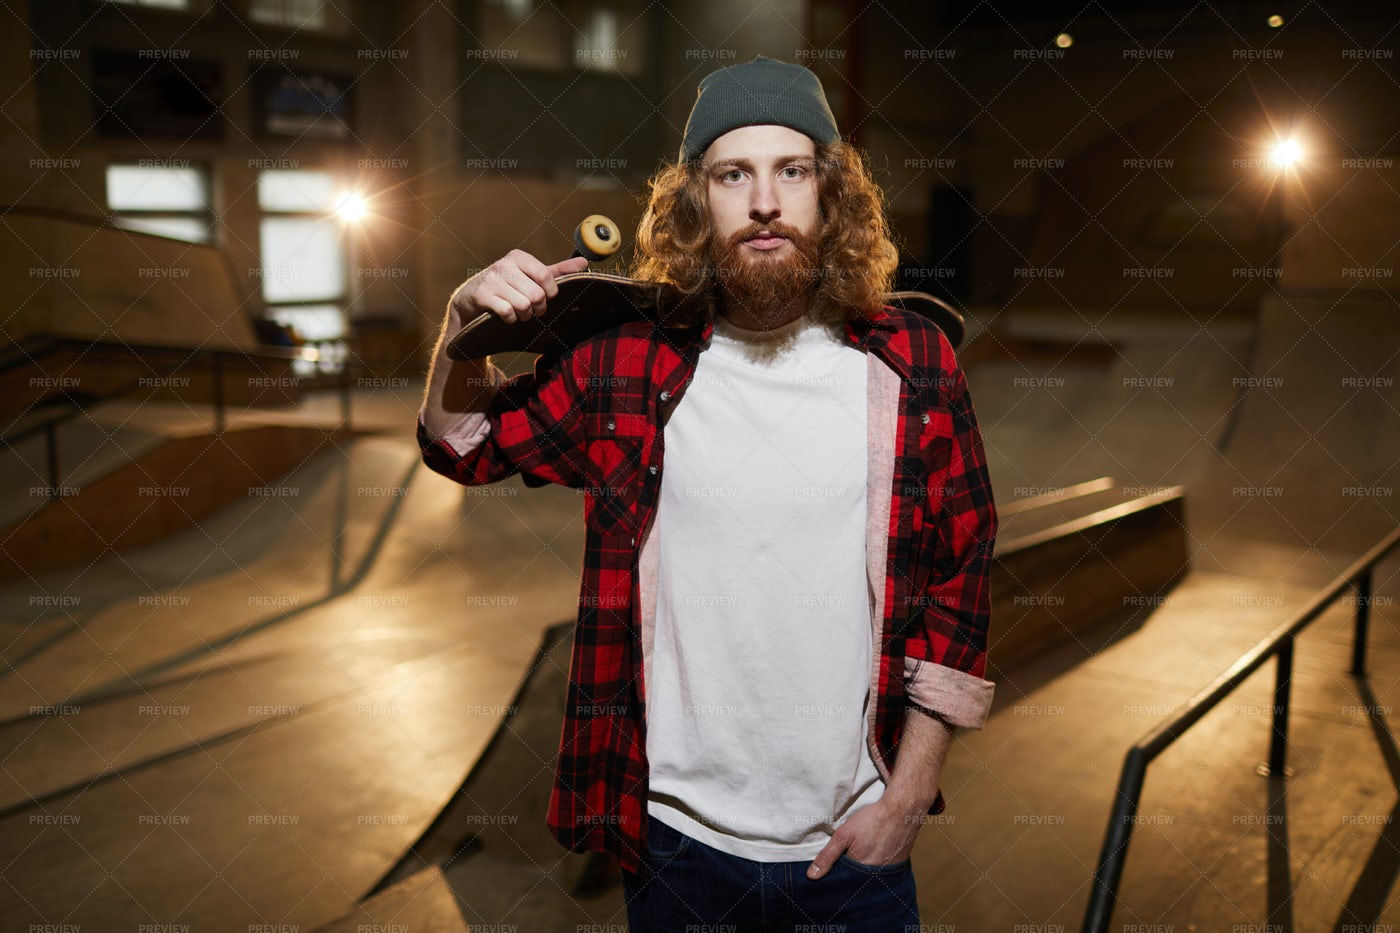 Bearded Skater Looking At Camera: Stock Photos